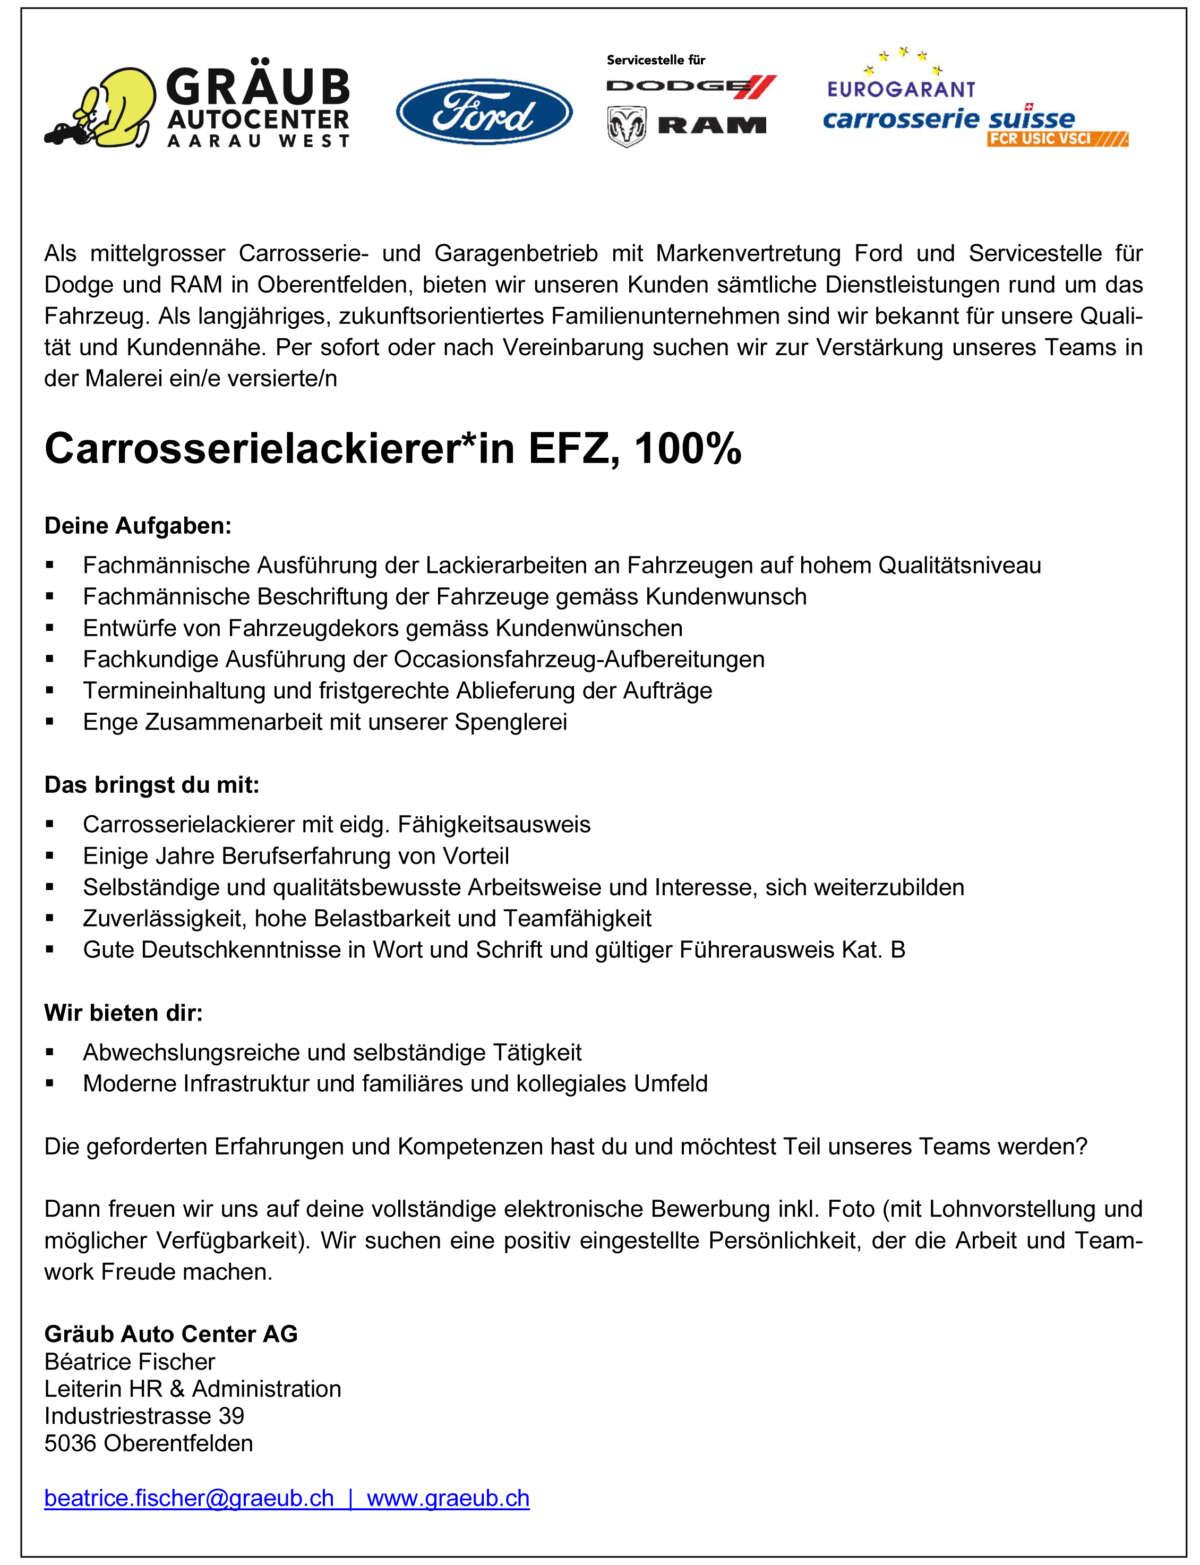 Inserat-Carrosserielackierer-2021-07-05.jpg#asset:762:headslider